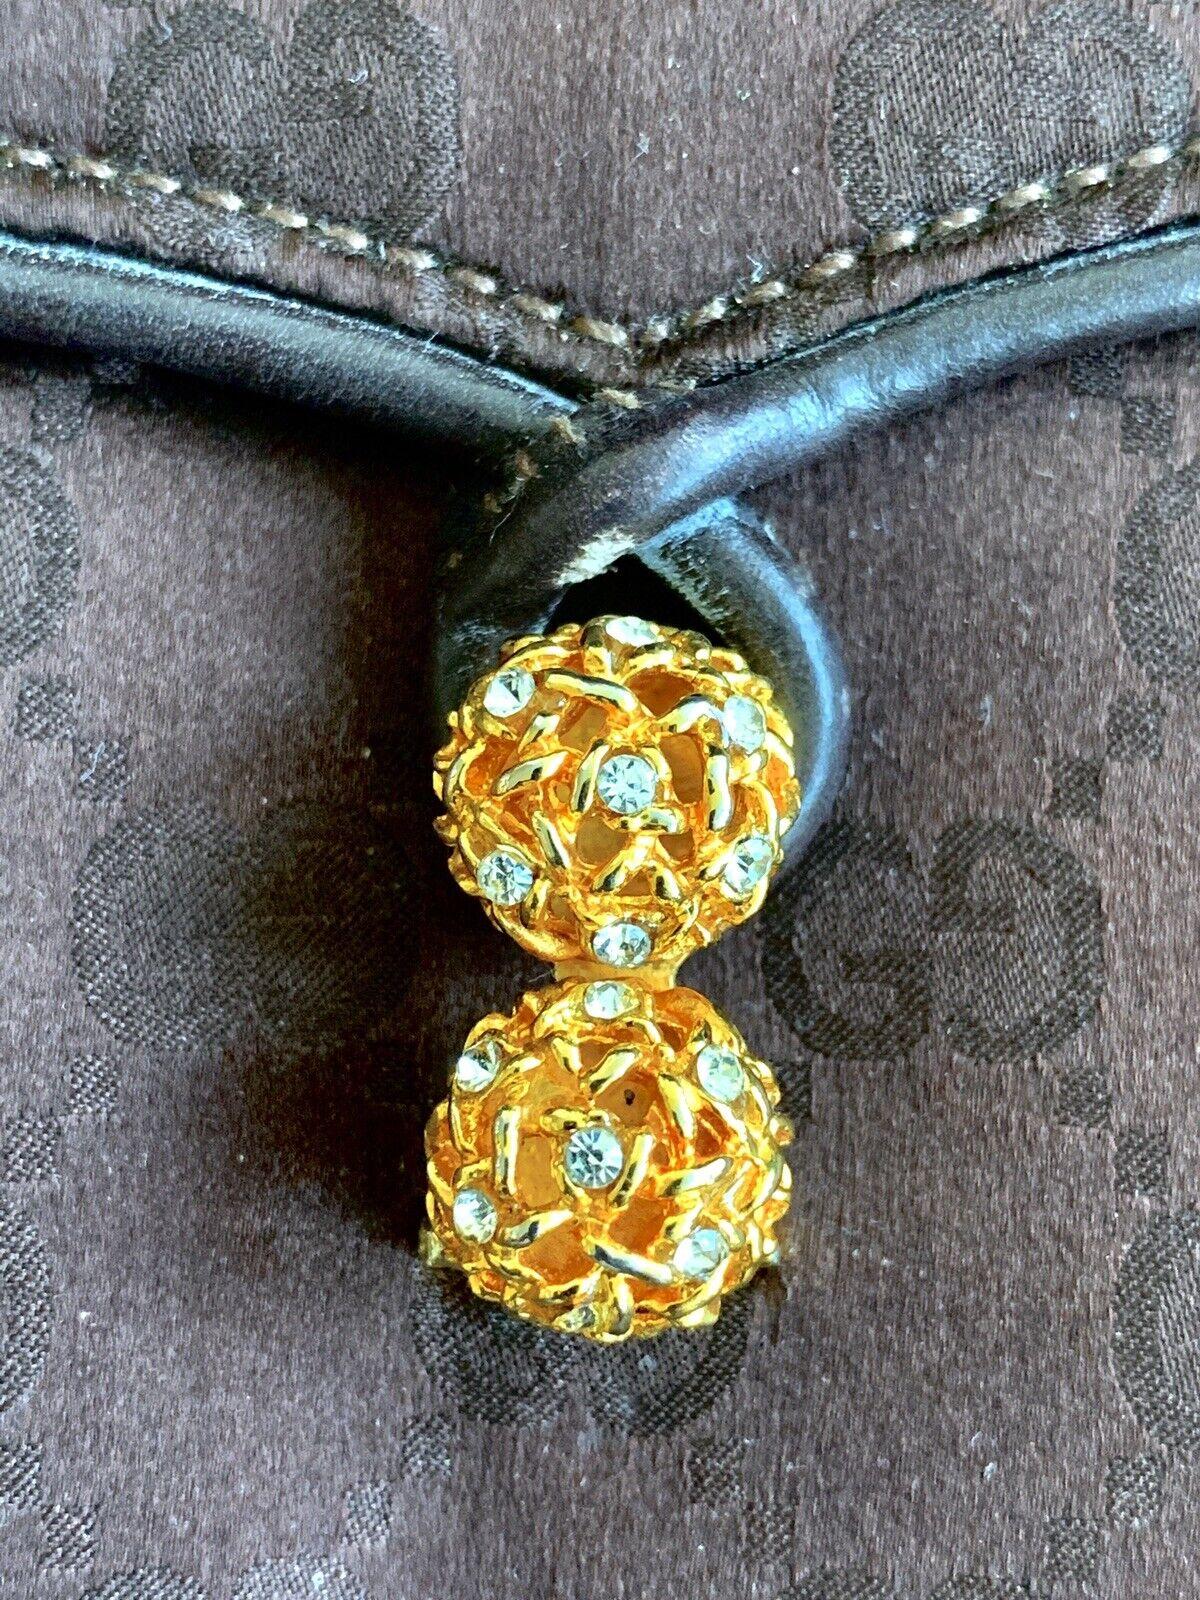 Gucci Vintage Classic Handbag with original box  - image 6